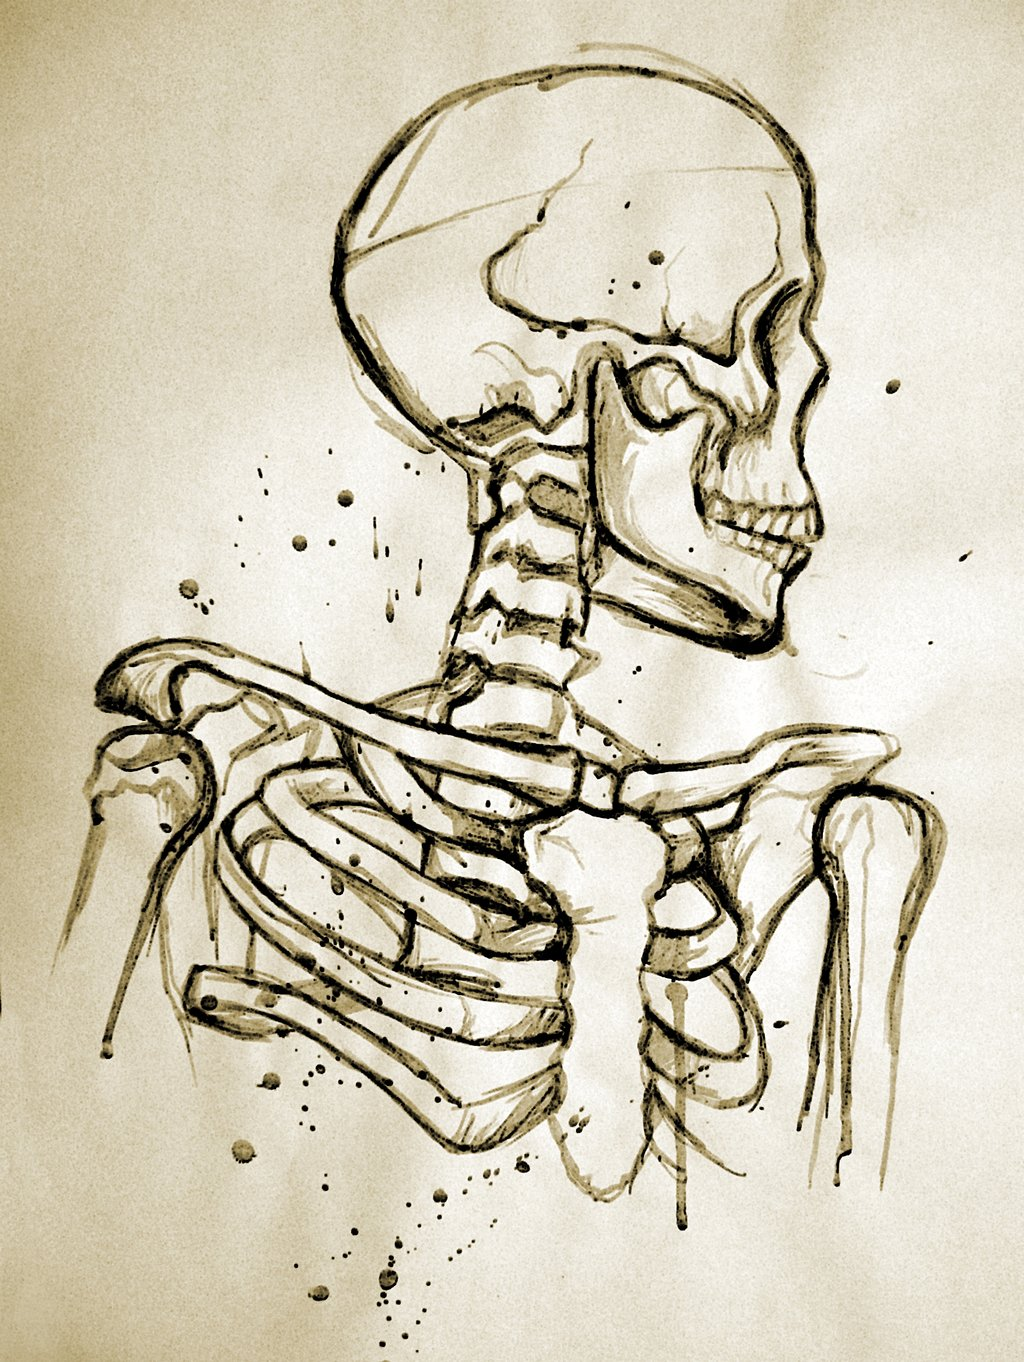 Drawn sleleton traditional Study Skeleton  by Unconventionally